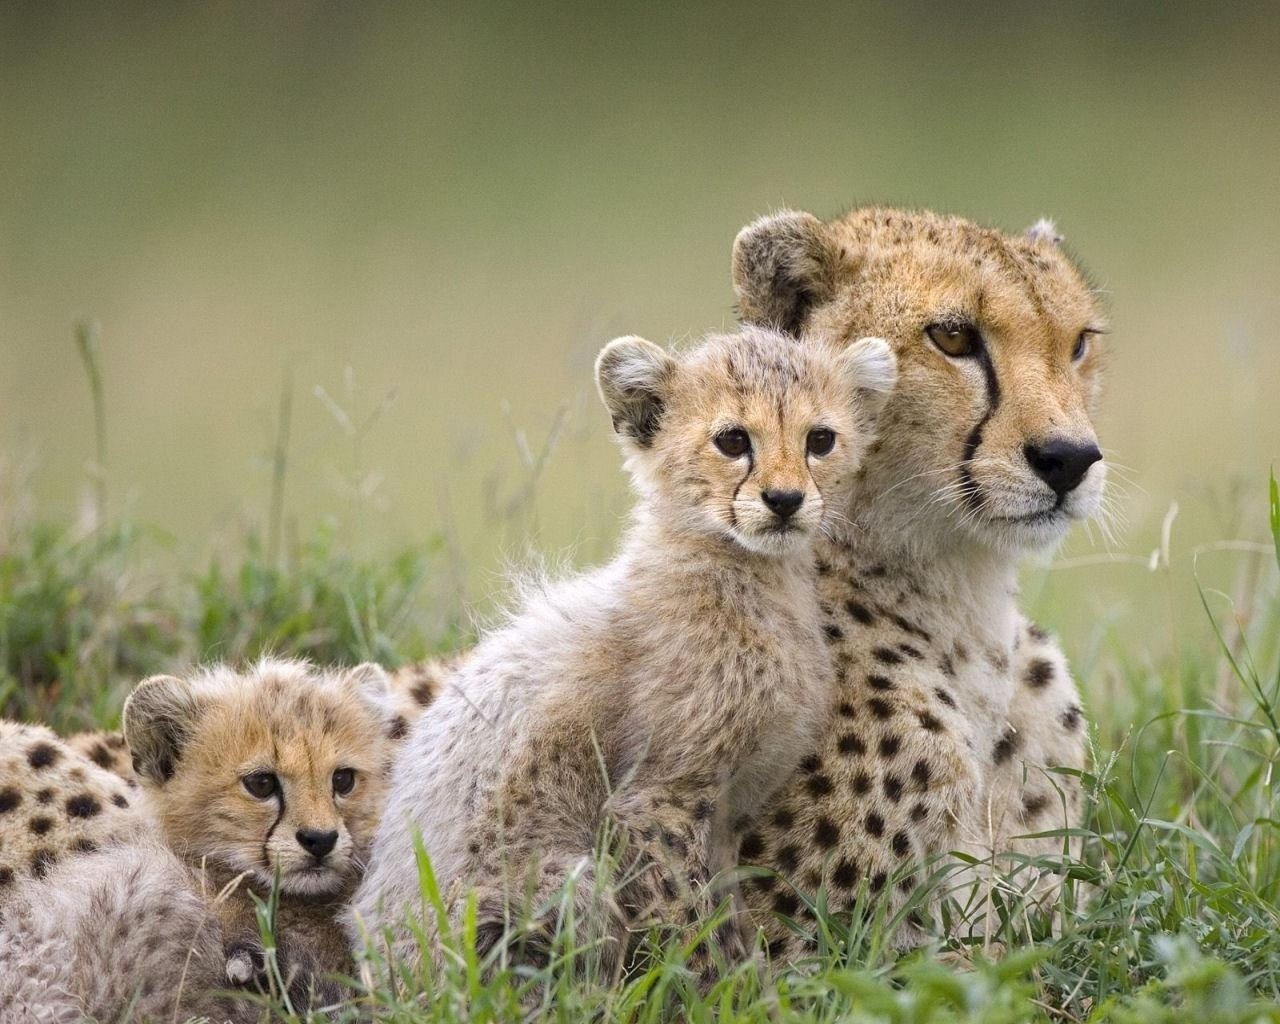 Cheetah Family   Wild Animals Wallpaper 2603080 1280x1024